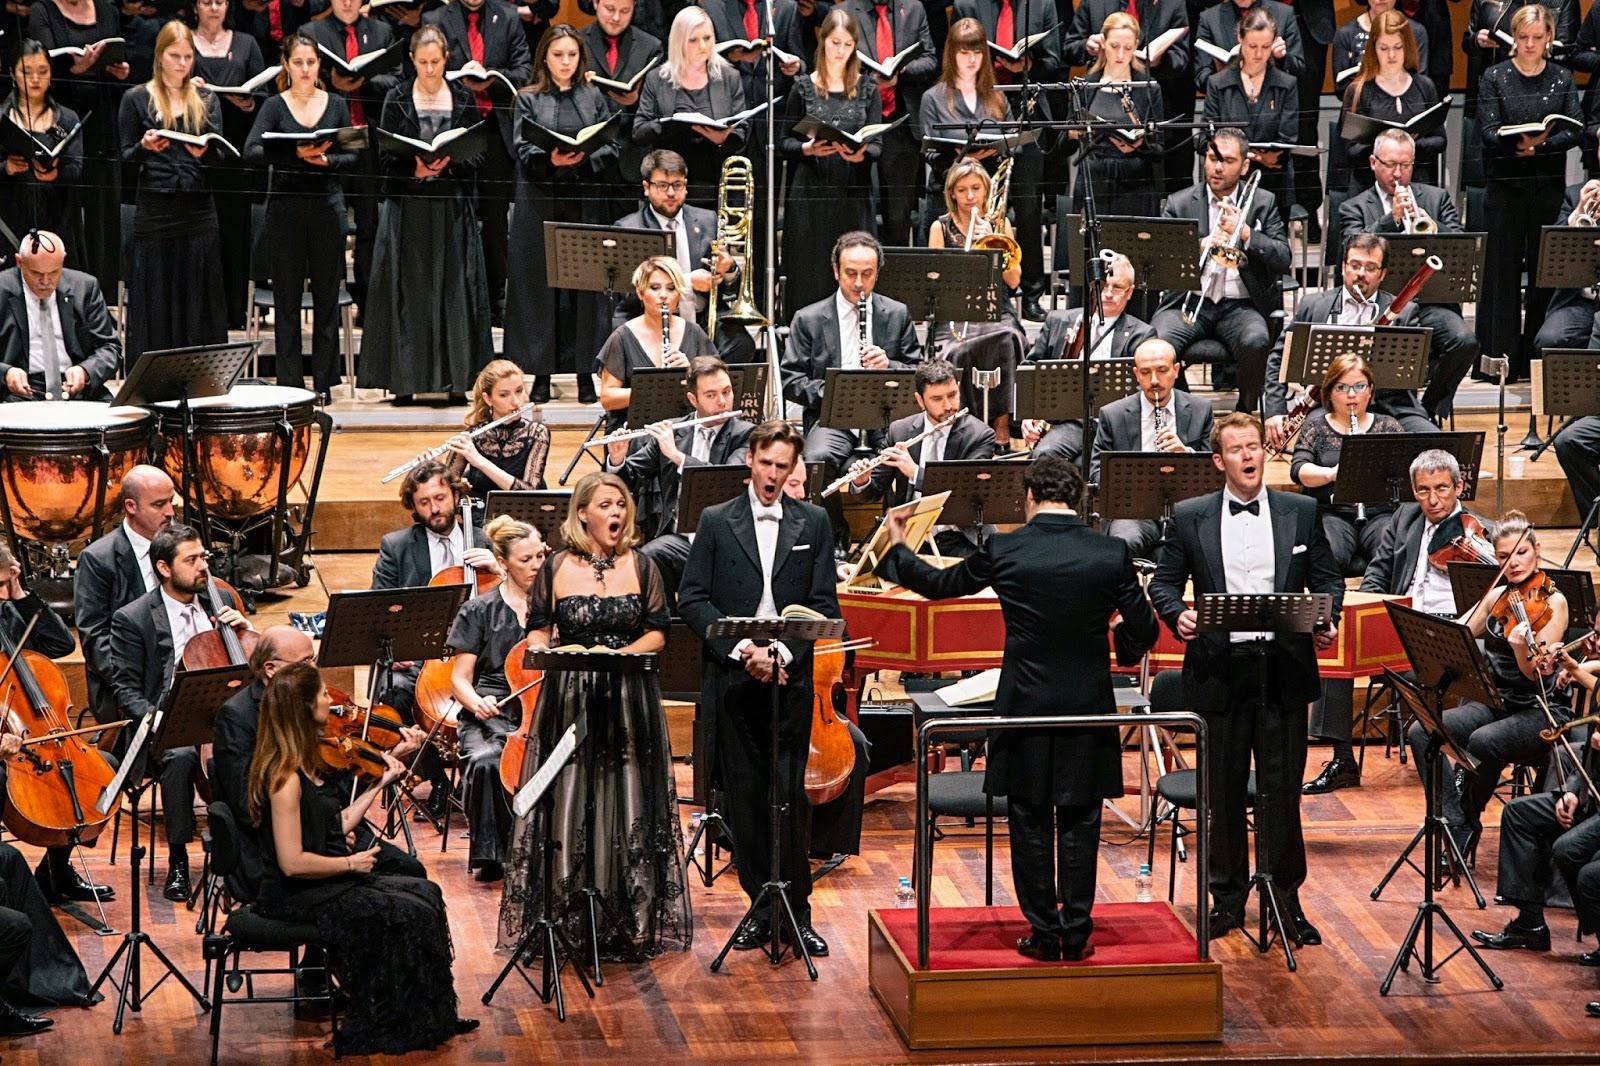 Miah Persson, Ian Bostridge, Duncan Rock, Sascha Goetzel, Salzburg Bach Choir, Borusan Istanbul Philharmonic Orchestra - Borusan Istanbul Filarmoni Orkestrasi - Photograph Ozge Balkan